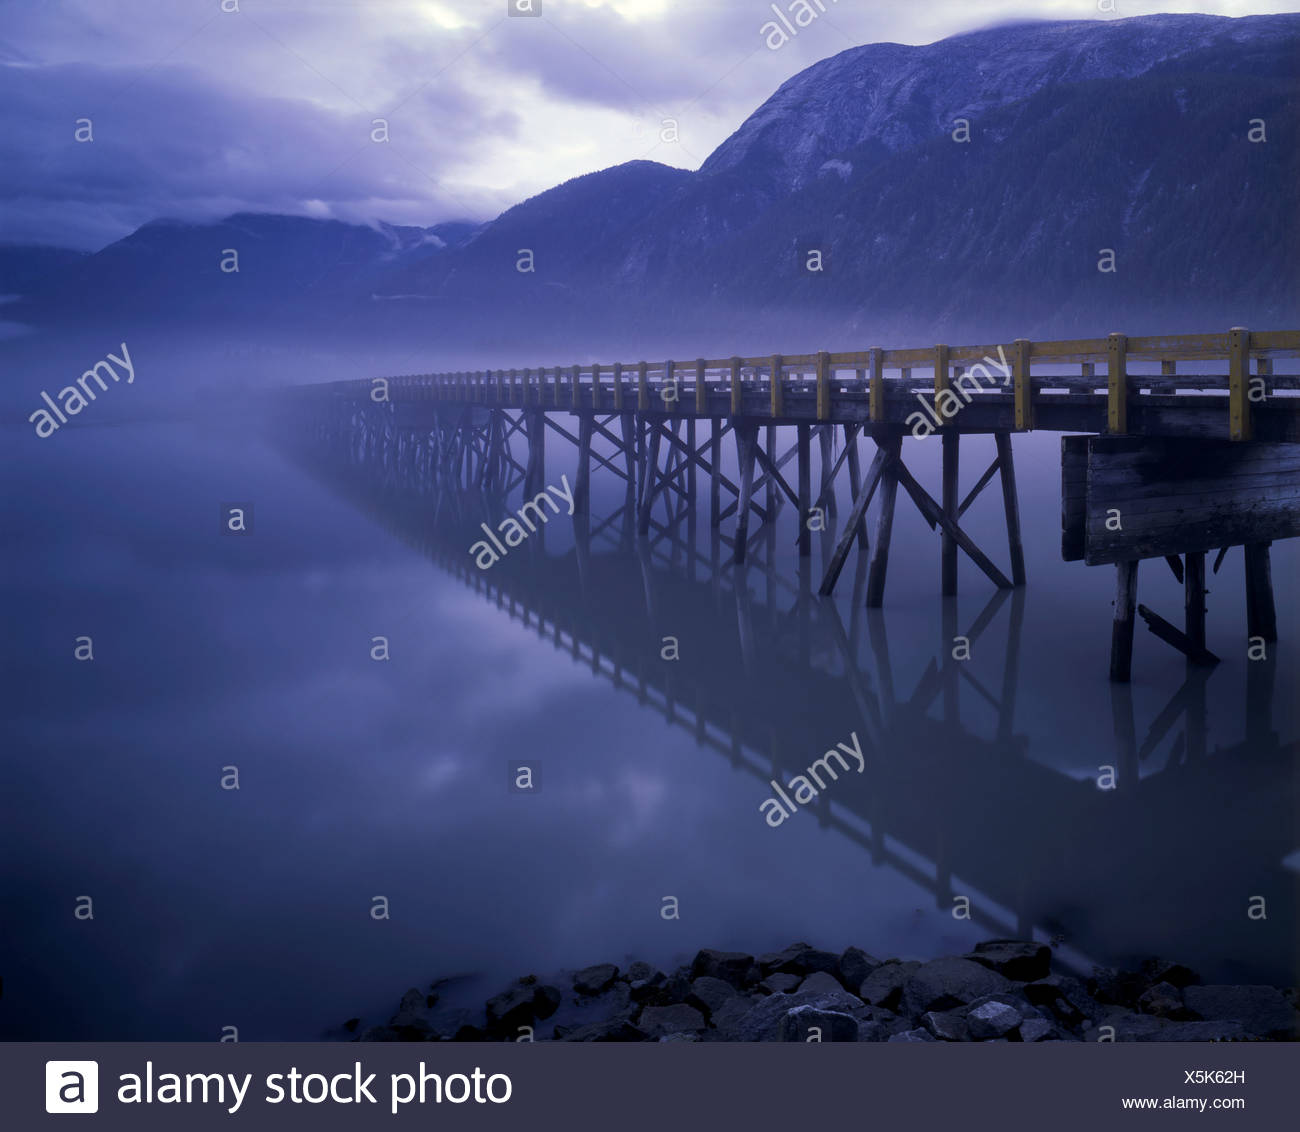 Alaska. Hyder. Bridge to Nowhere. Bridge dissolving into a rainforest mist in Alaska's Southeast region. - Stock Image